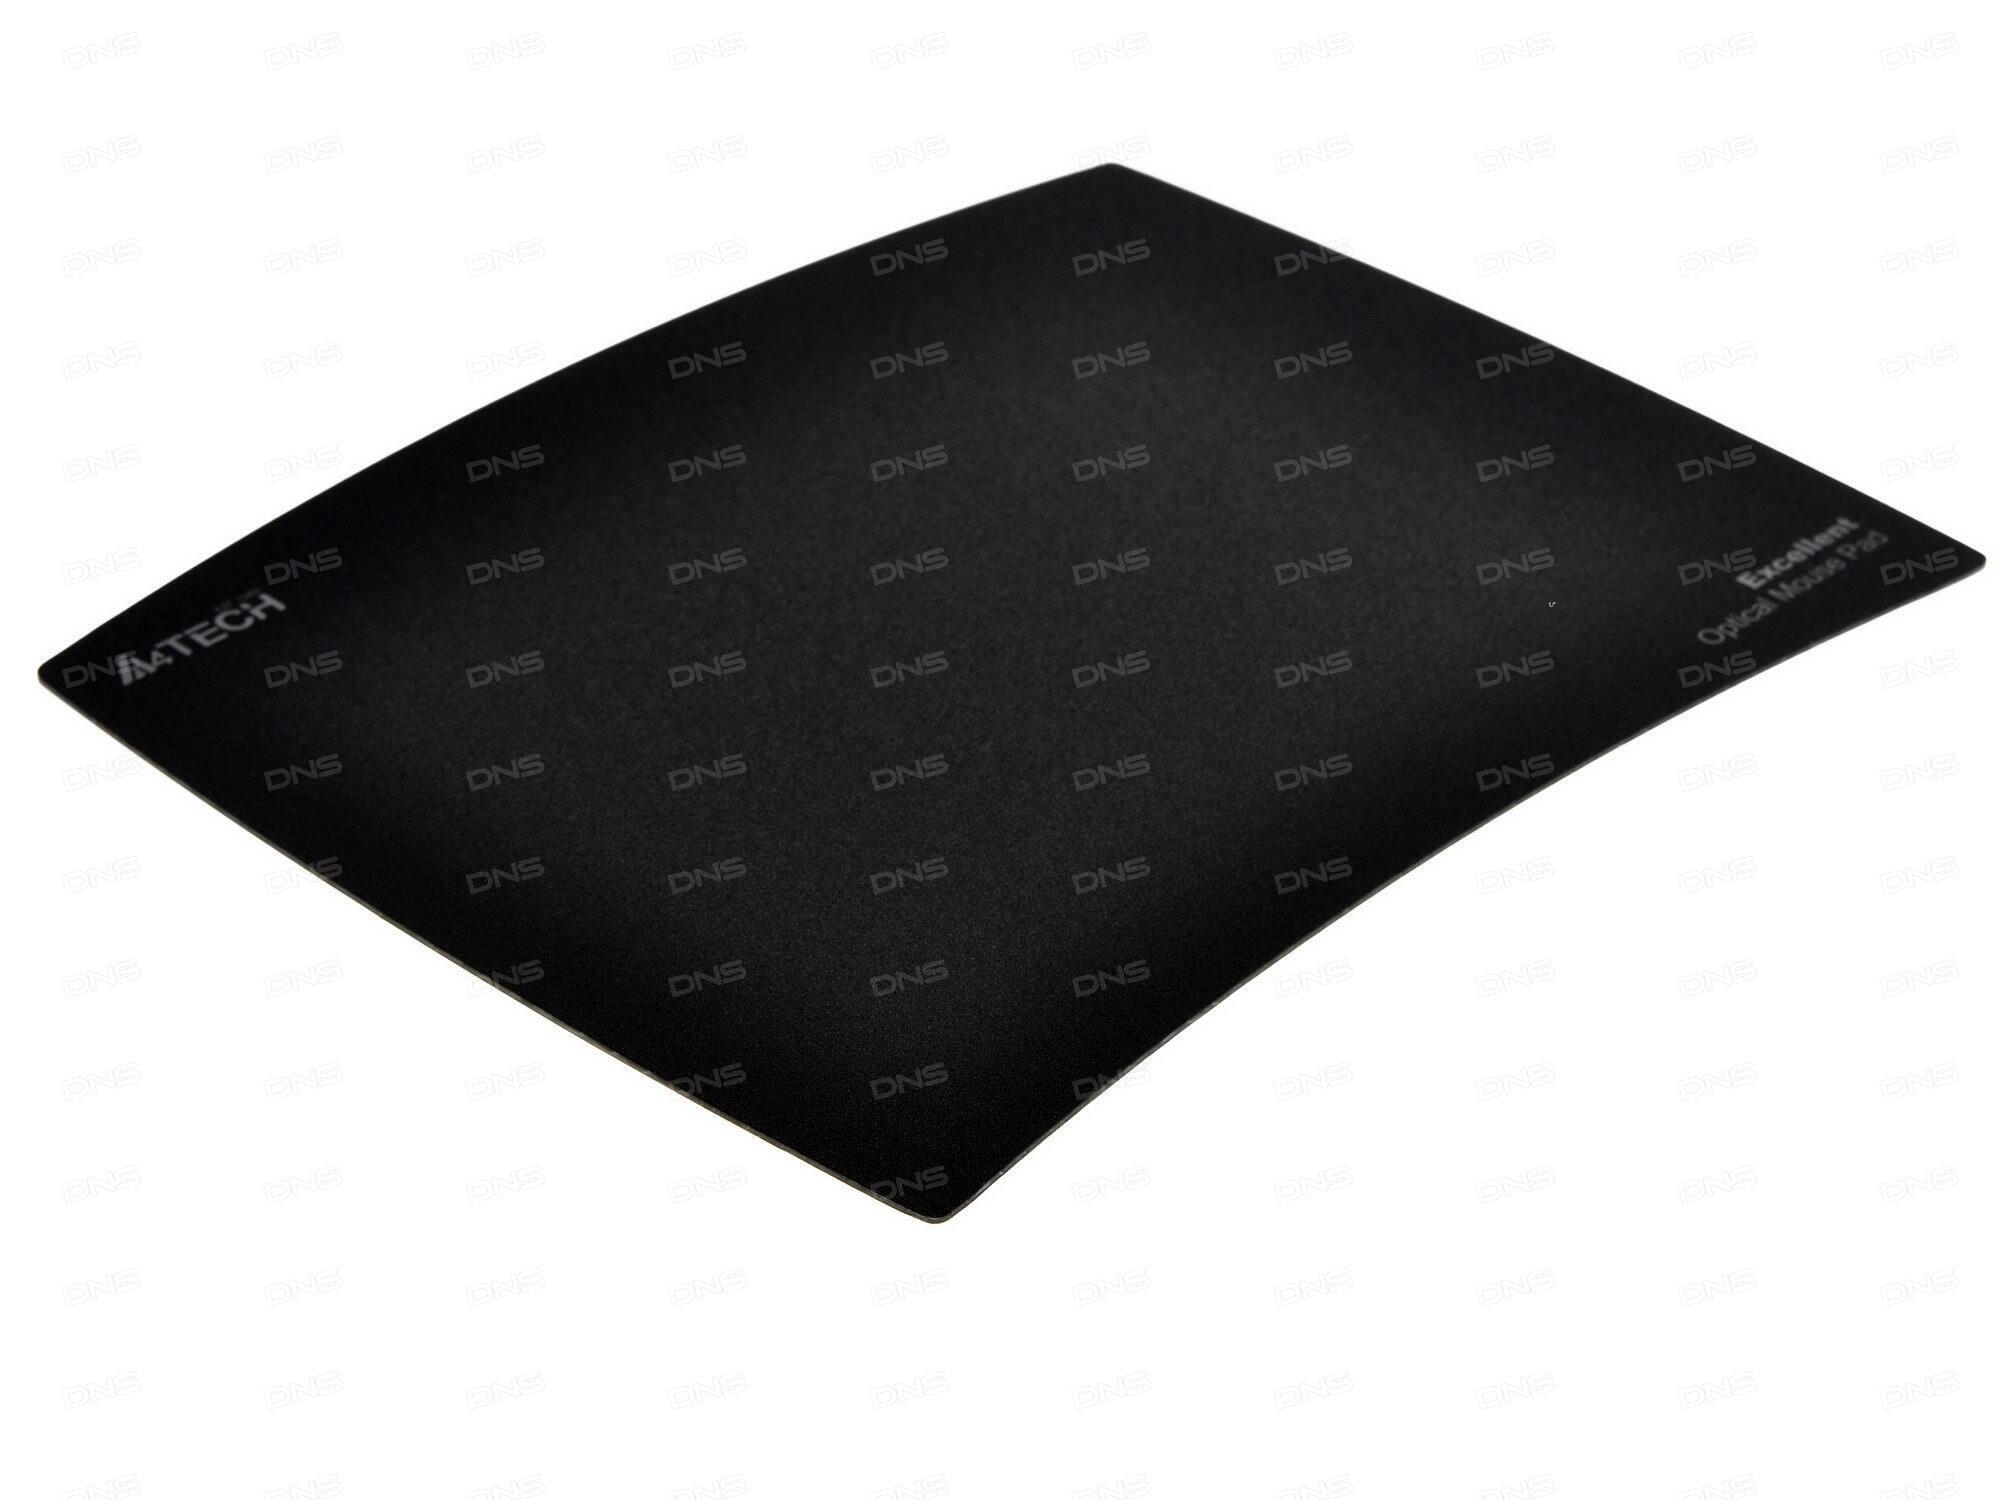 Коврик для  мыши Defender тканевый GP-800 Viking текстура резина 405*285*30